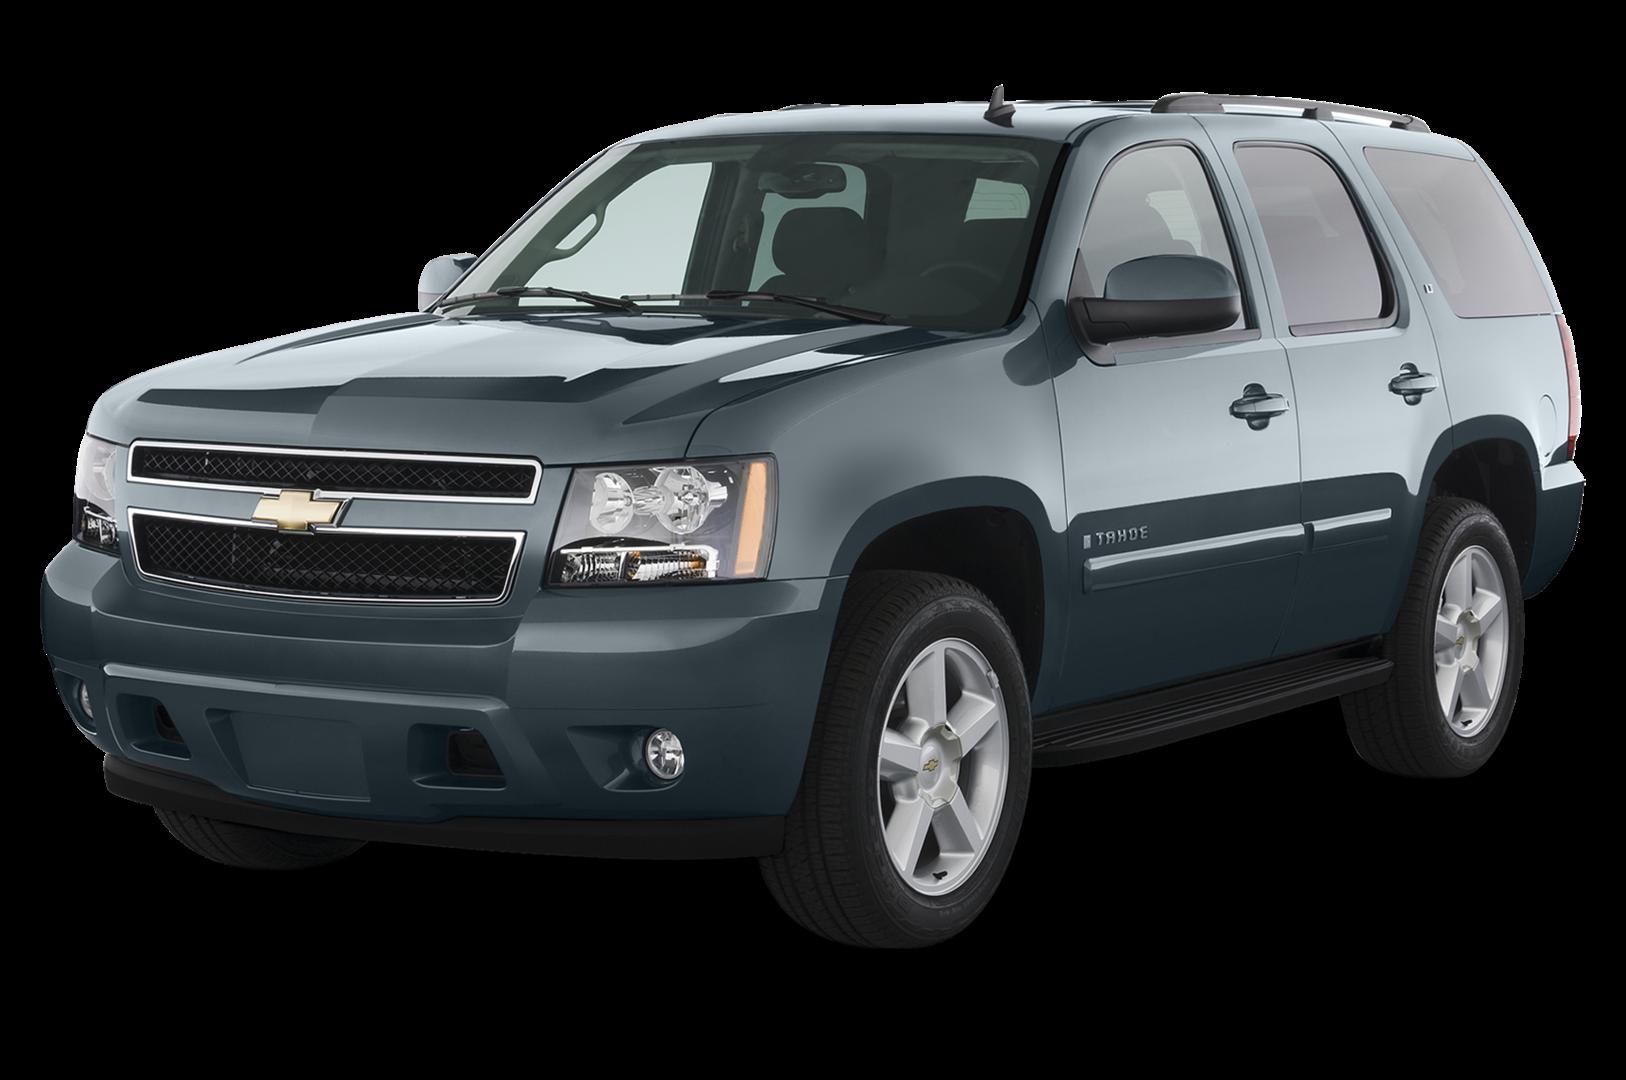 10 Chevrolet Tahoe | 2013 chevrolet tahoe